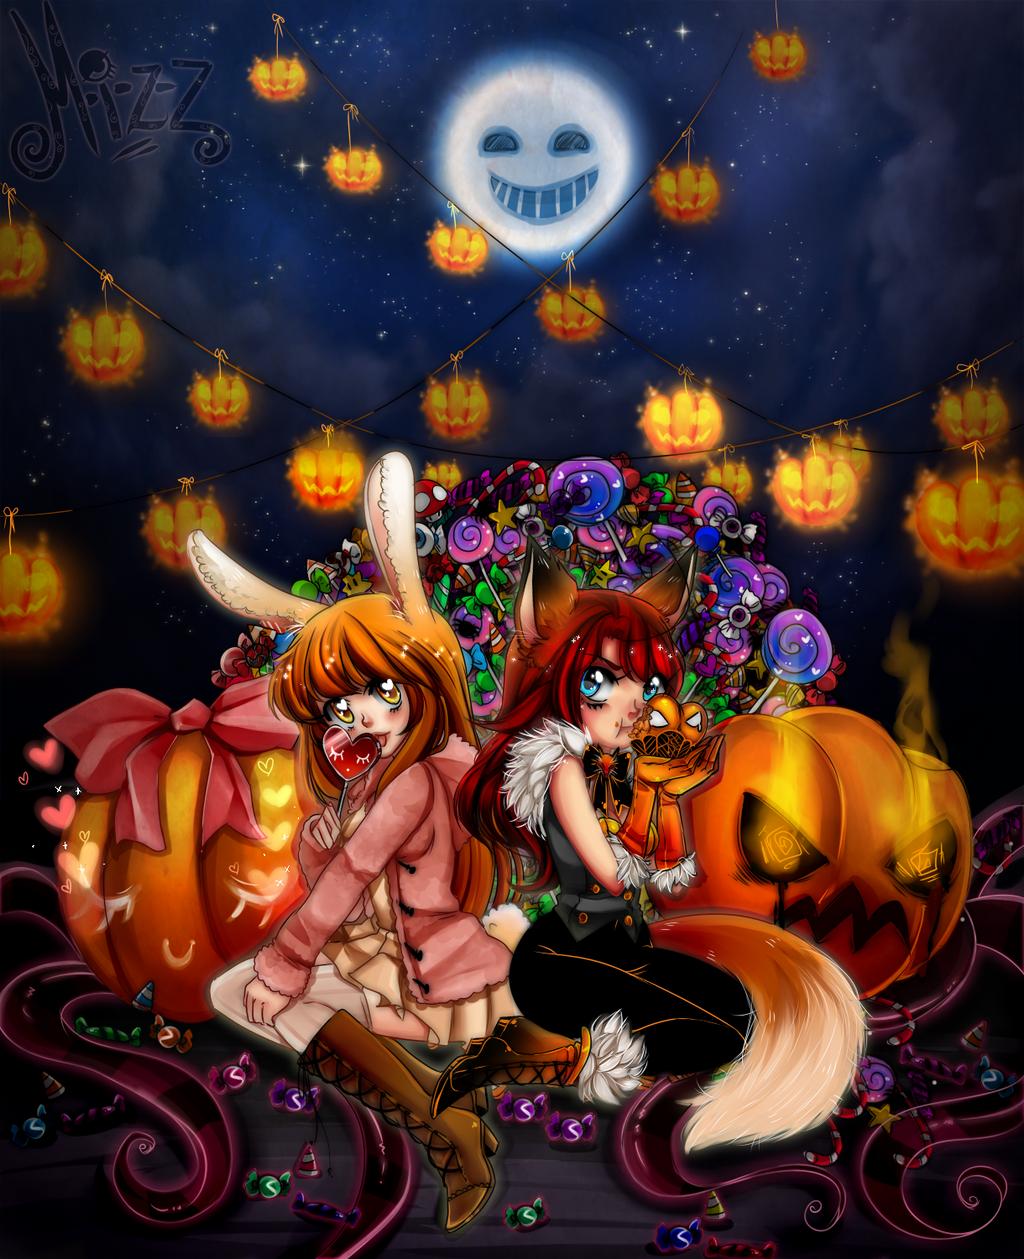 Foxy x Bunny by KuroiiFox